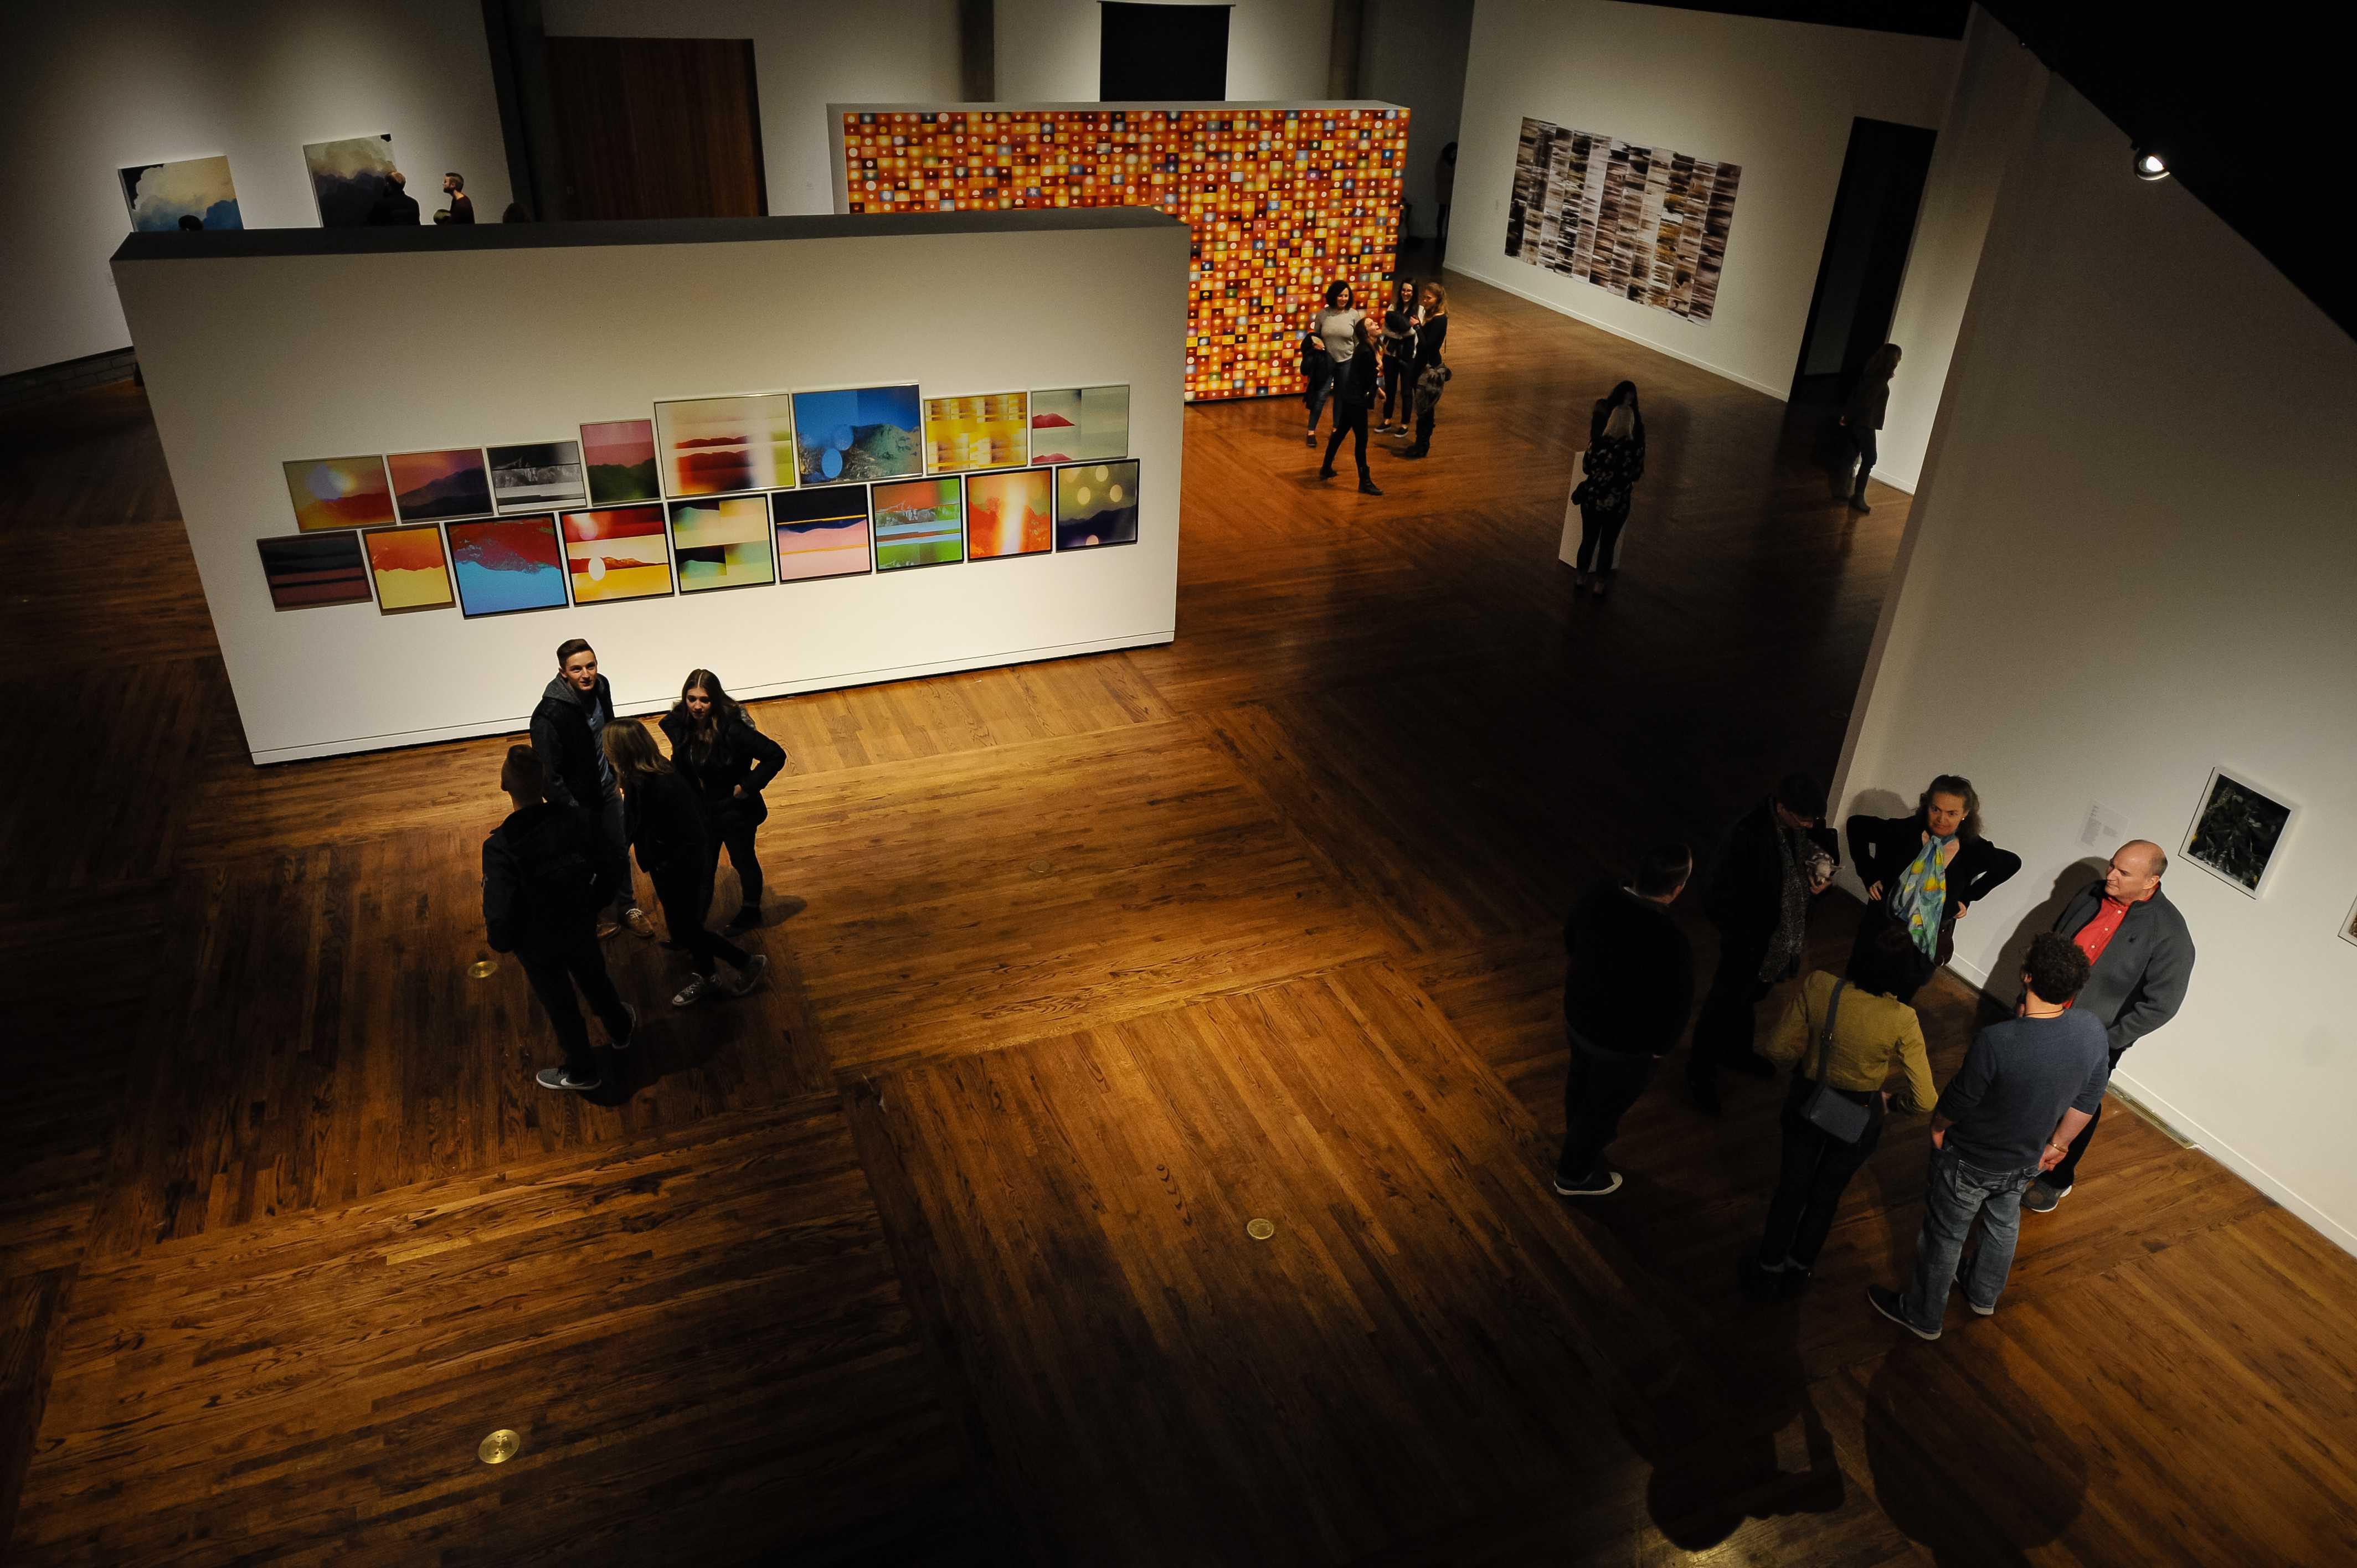 The Permadeath Art Exhibit at the Utah Museum of Contemporary Art Salt Lake City, UT on Friday, Jan. 26, 2018  (Photo by Adam Fondren | Daily Utah Chronicle)